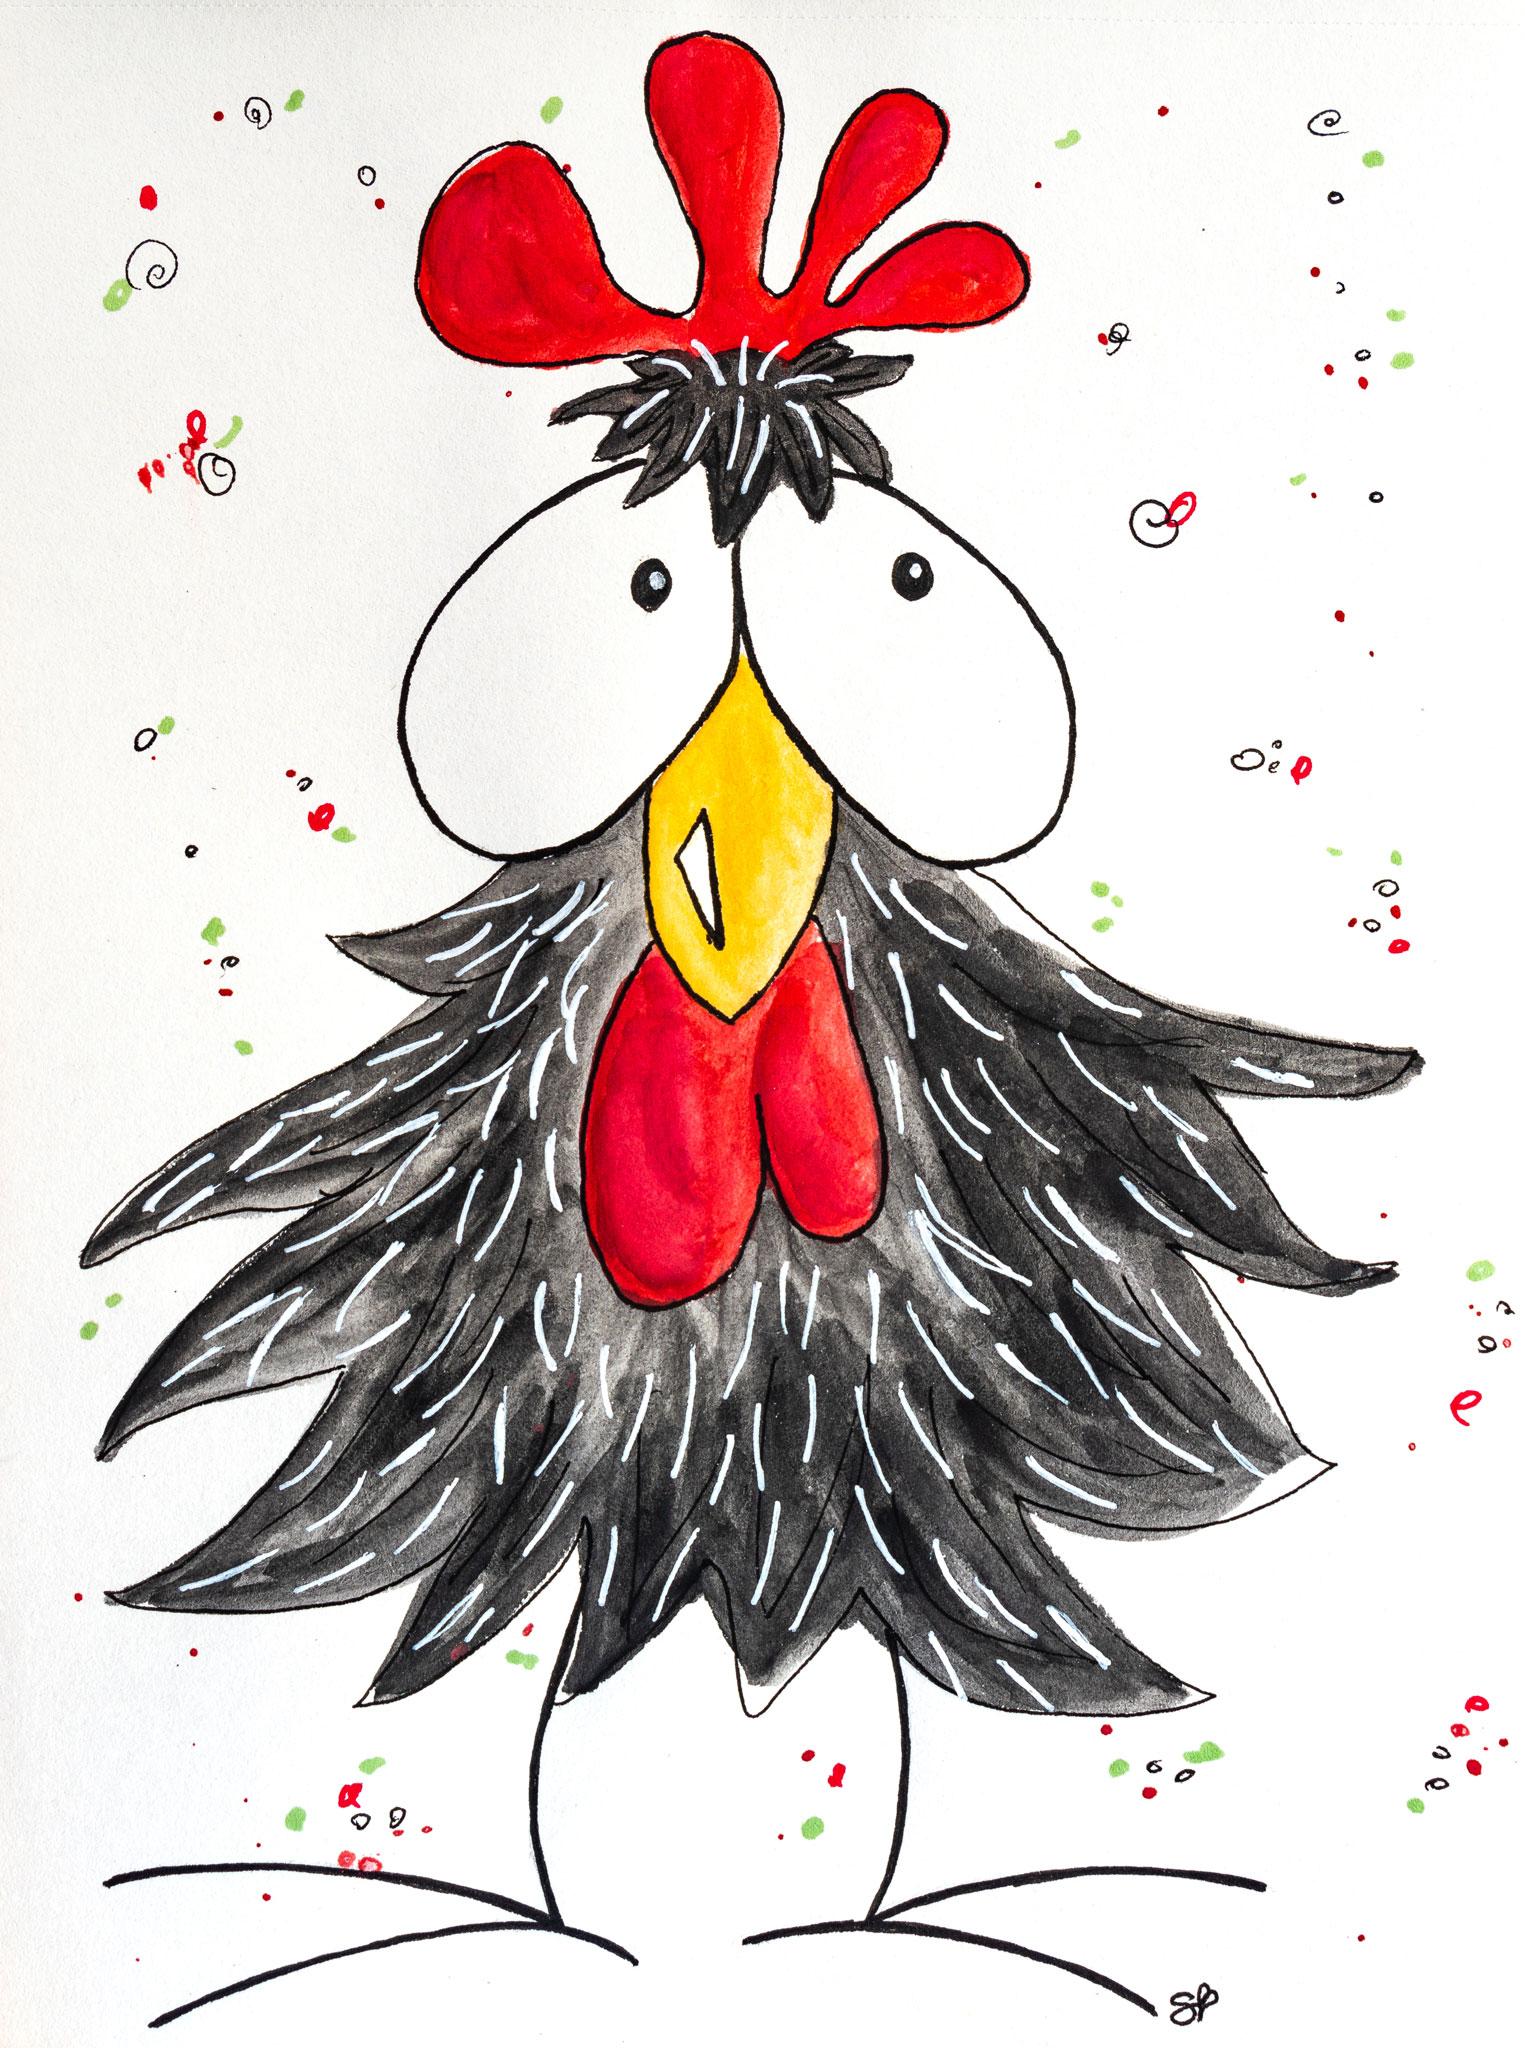 Huhu, ein Huhn